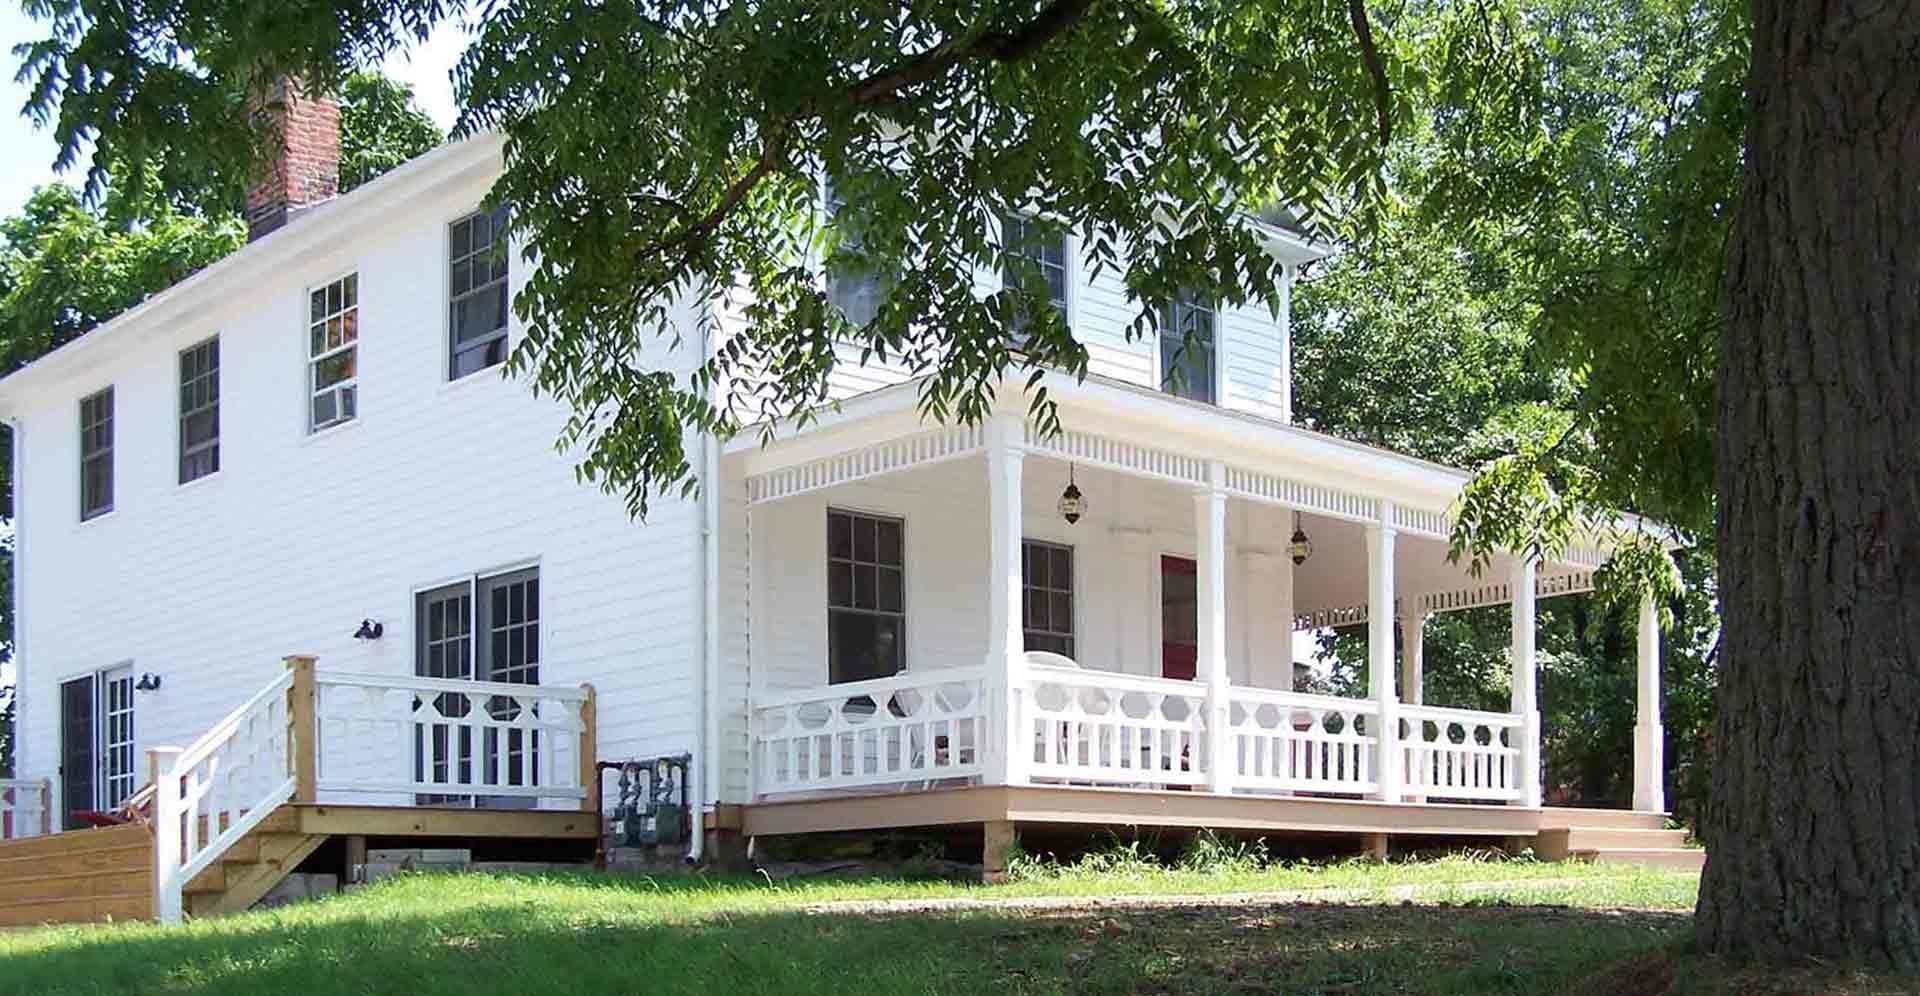 Hotchkiss Multi-family House